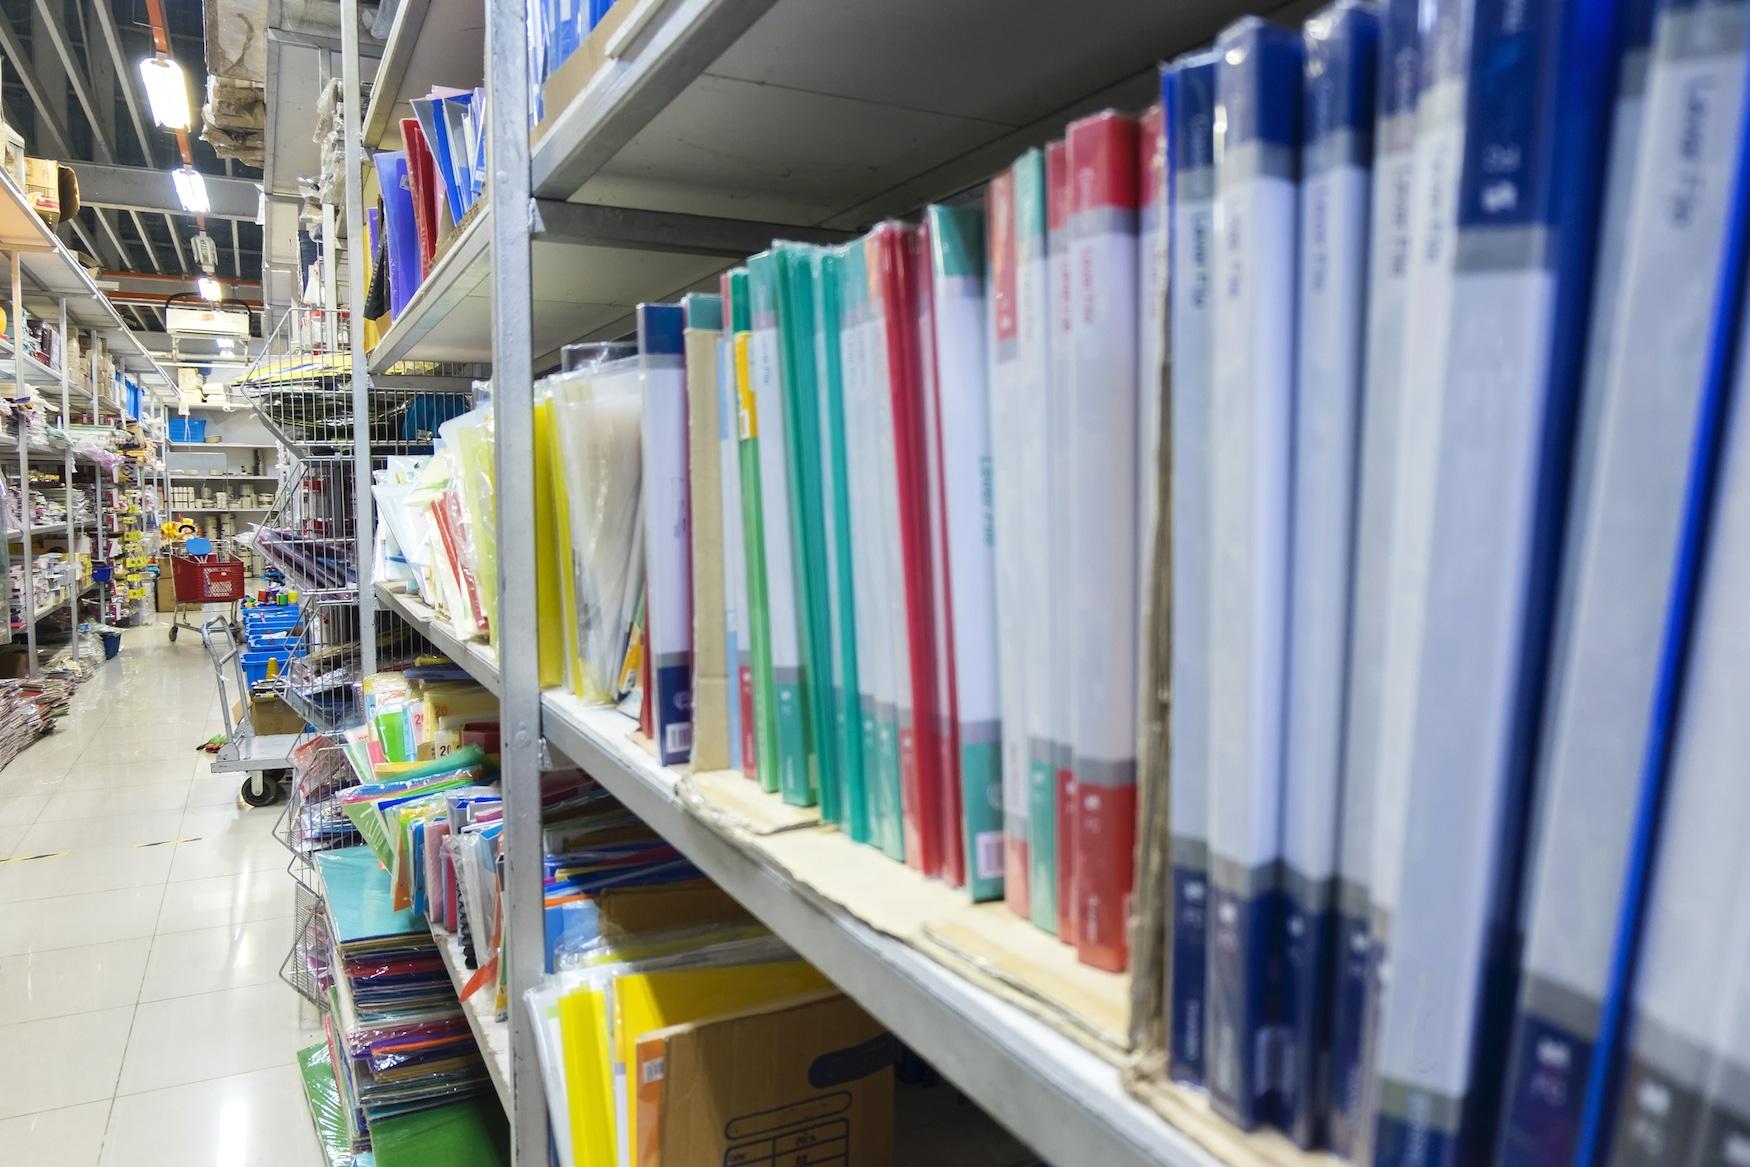 office-supplies-binders